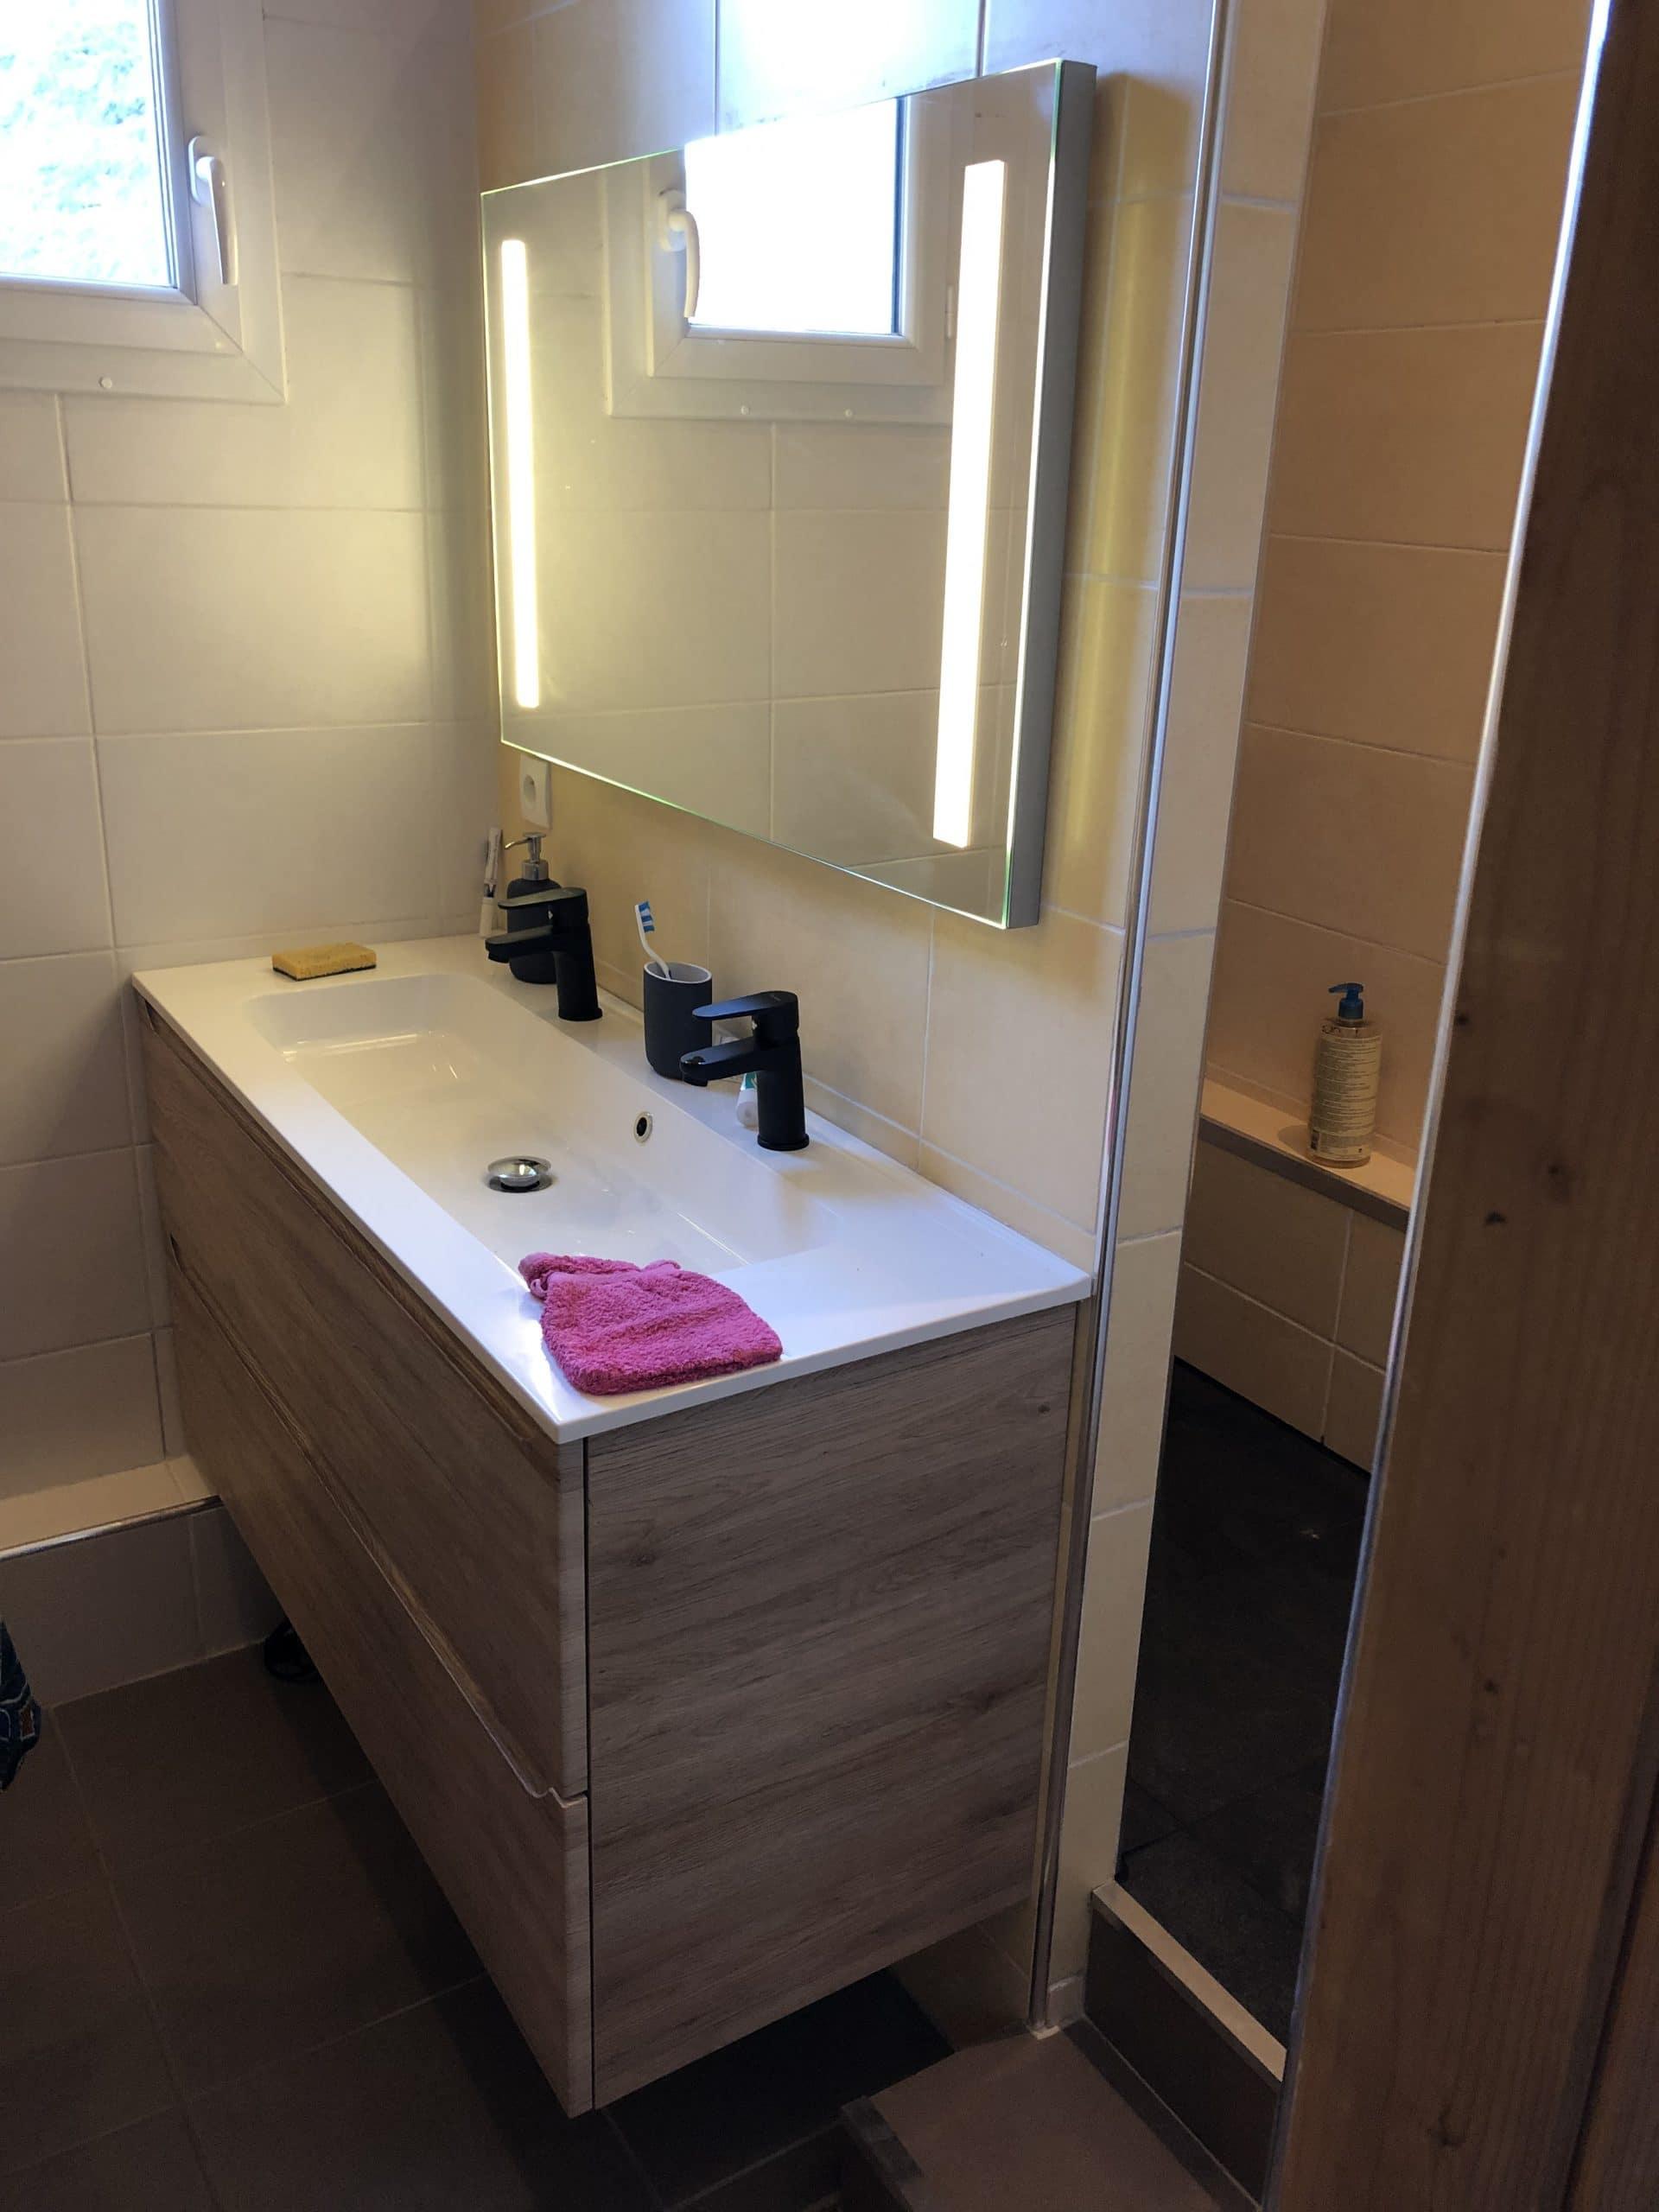 Moderniser Salle De Bain moderniser une salle de bain à saint-maurice-de-beynost - illico travaux